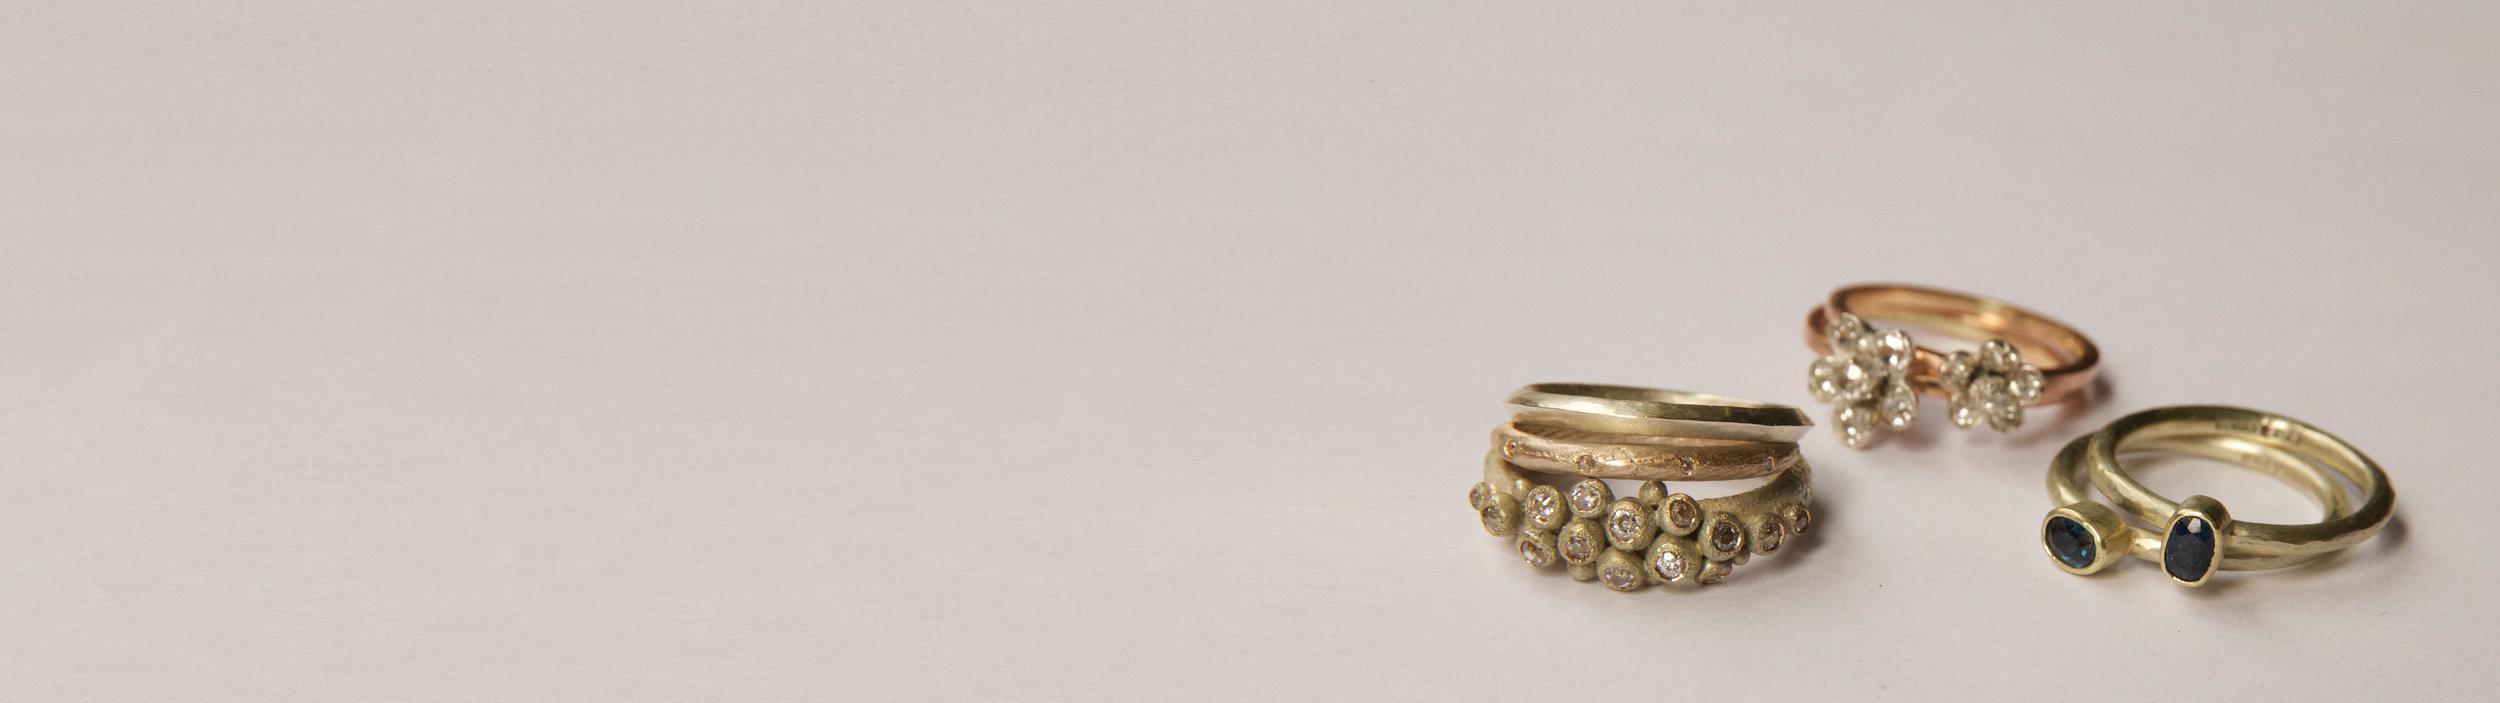 sian-evans-bespoke-rings.jpg